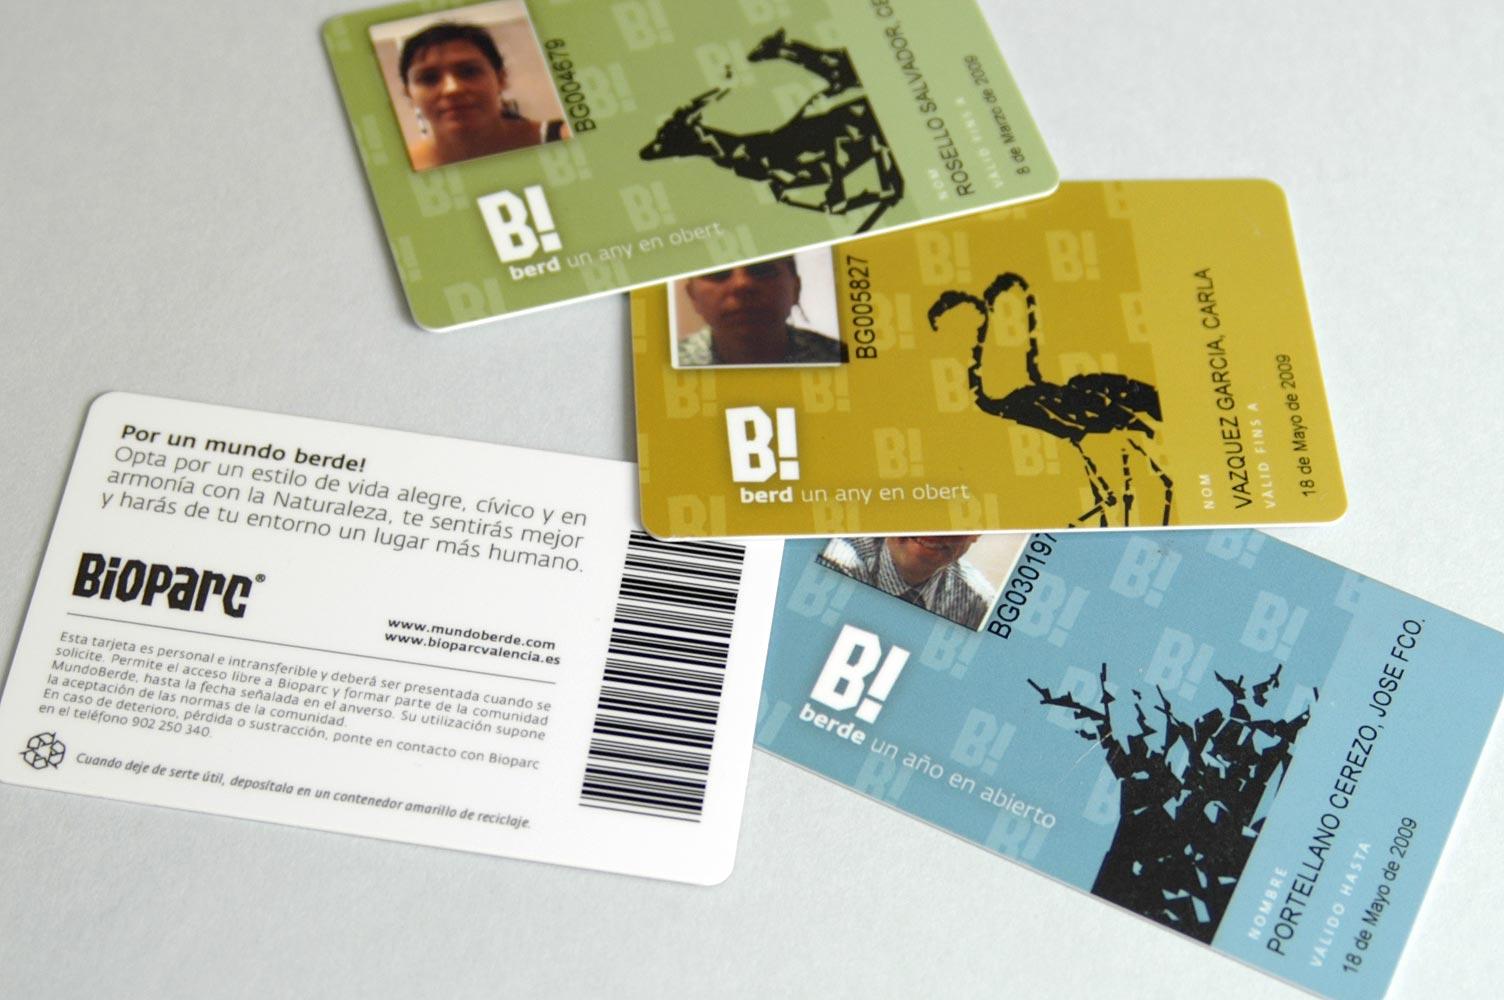 Bioparc diseño pase anual Berde!